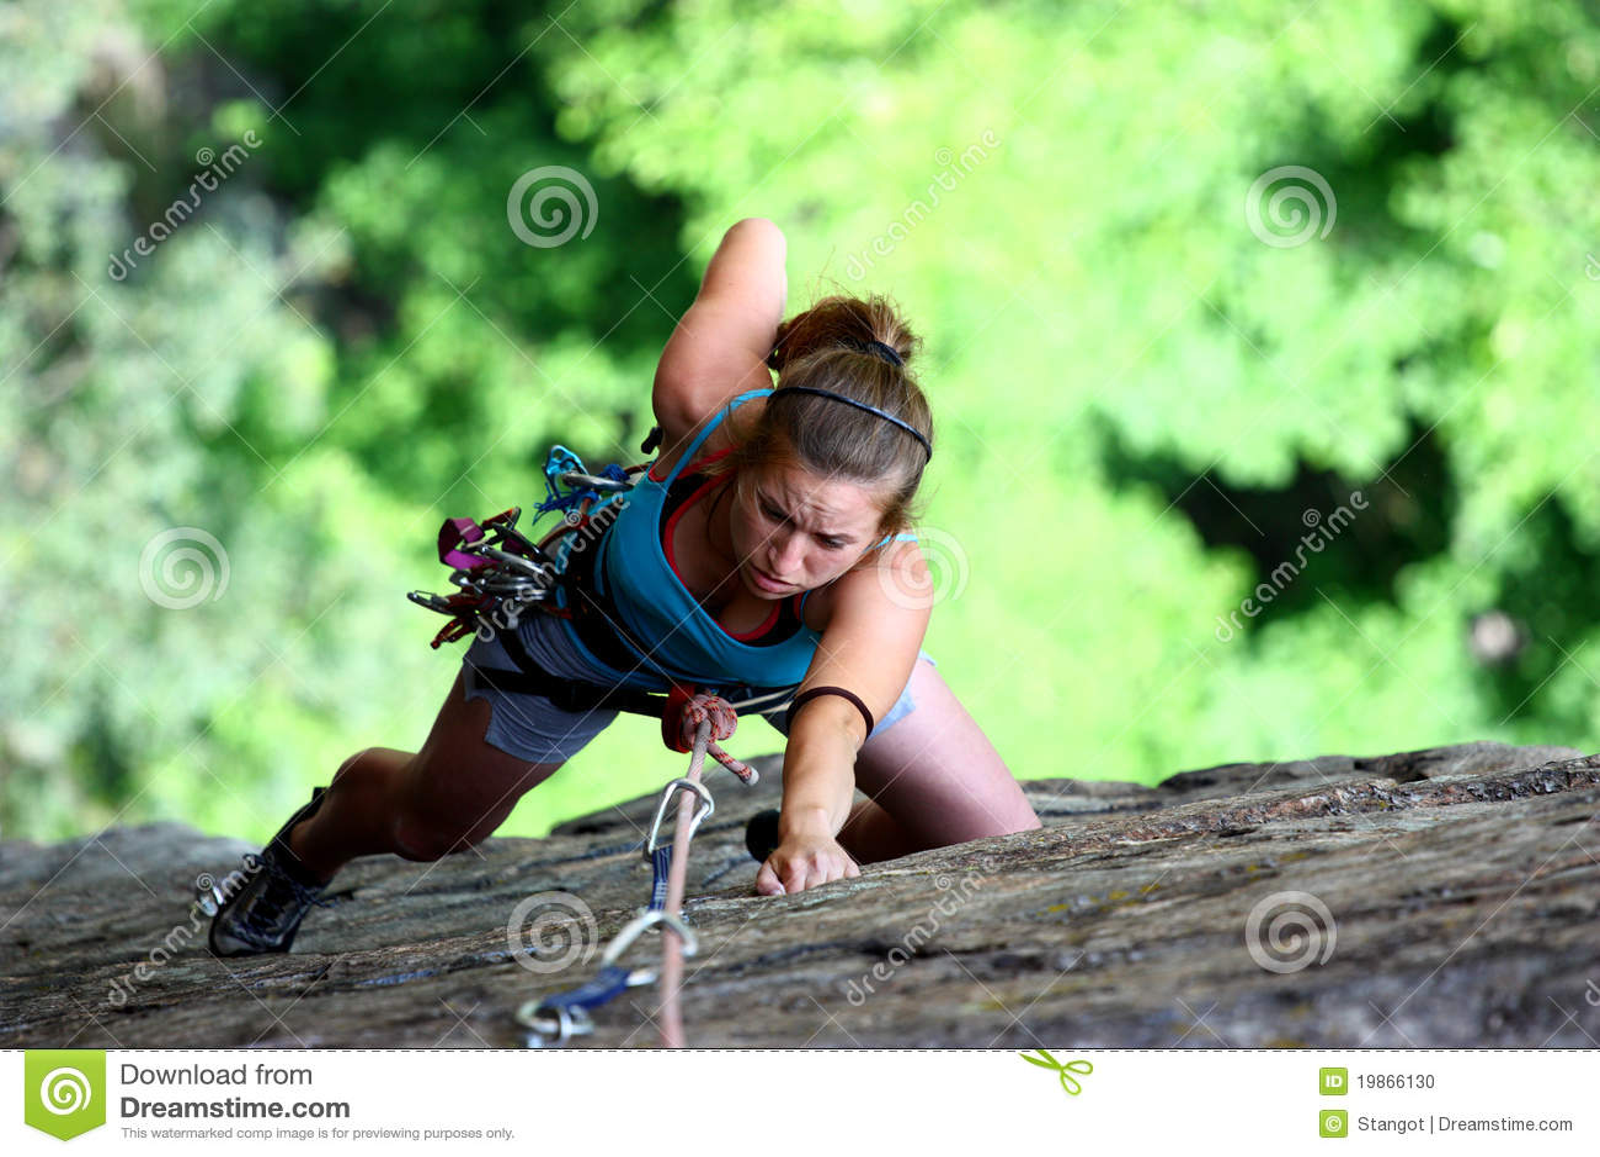 female extreme climber and - photo #26